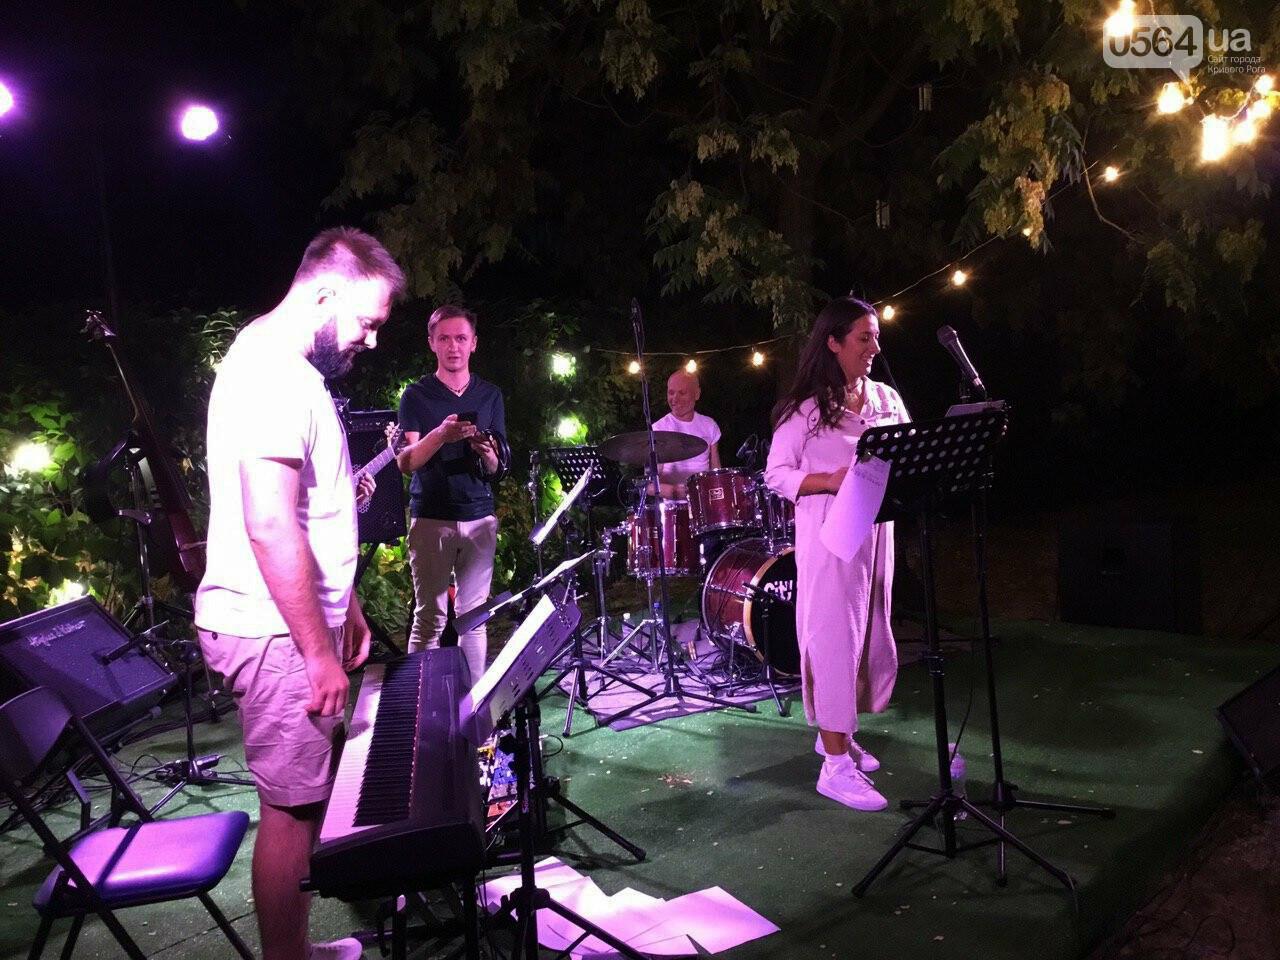 Под звездным небом криворожане наслаждались летним джазом от  Advantage Project, - ФОТО, ВИДЕО , фото-14